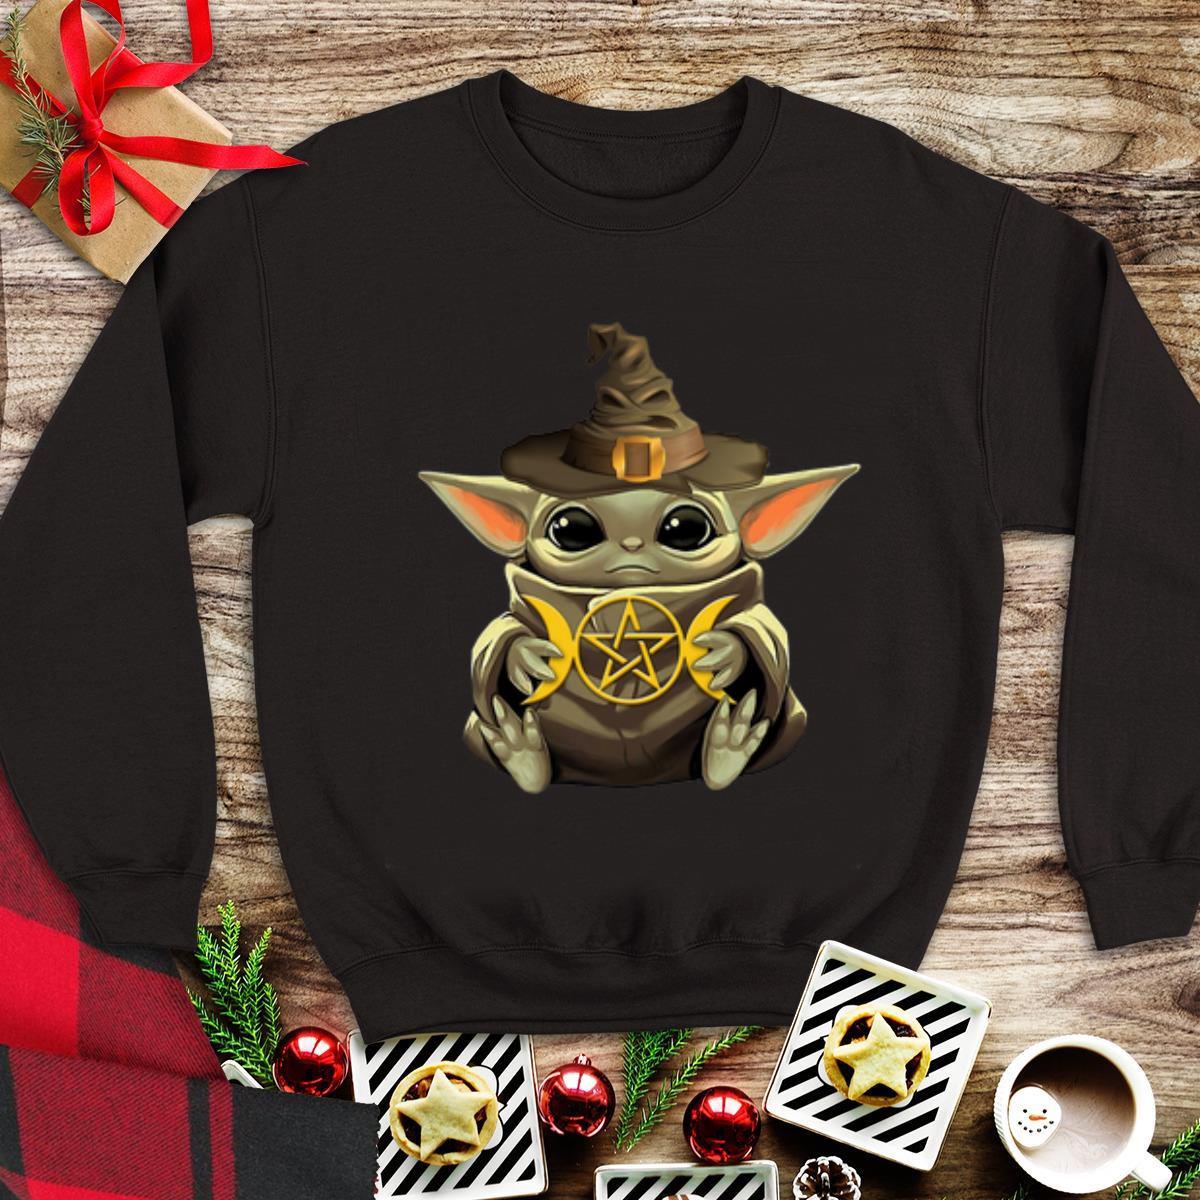 Awesome Baby Yoda Hug Harry Potter Shirt 1 1.jpg